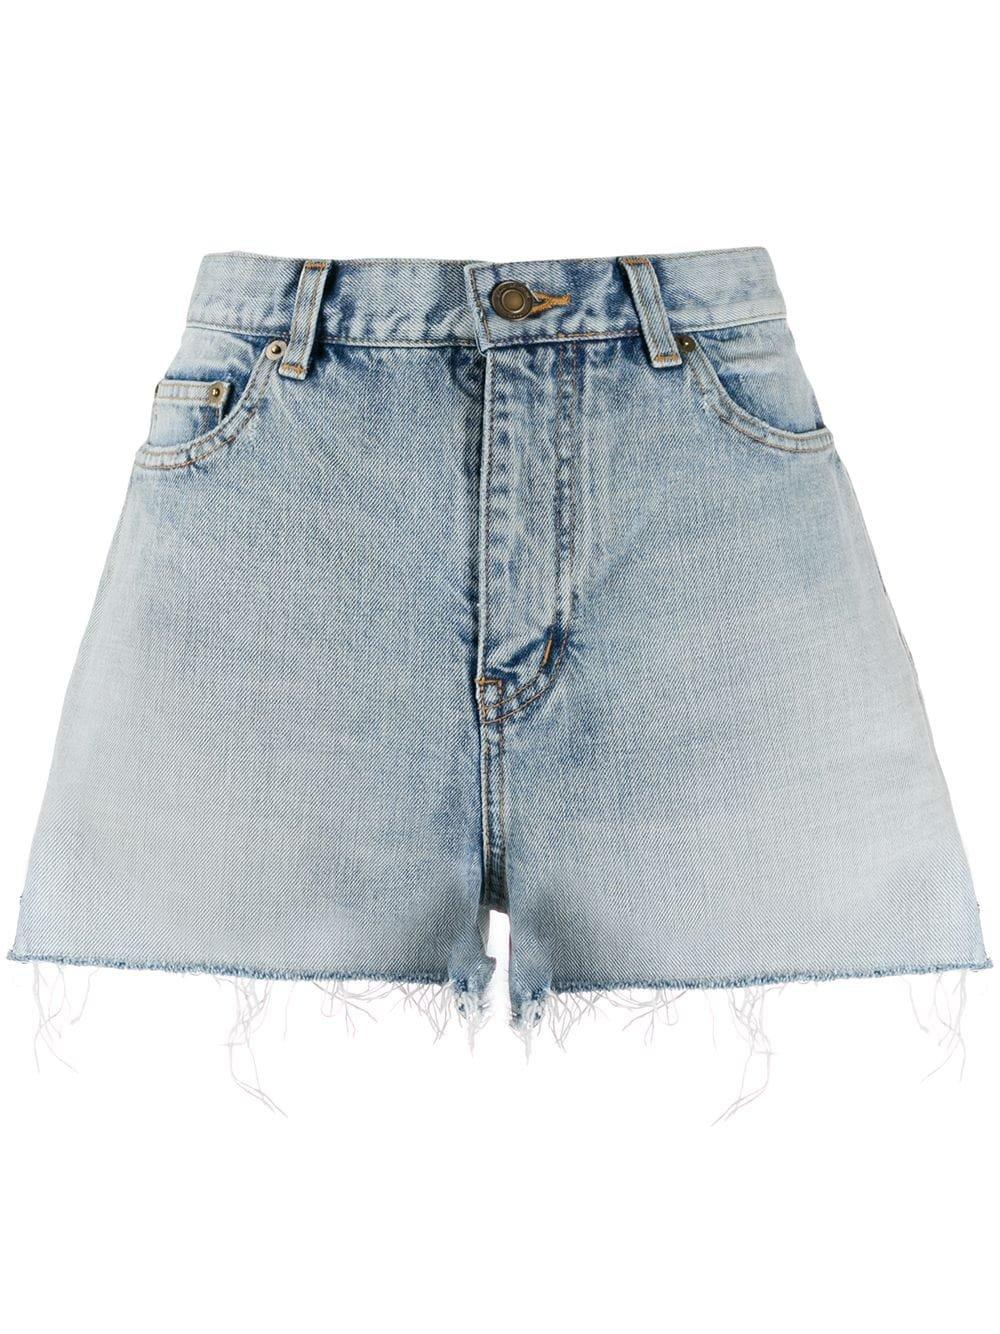 Saint Laurent unfinished hem denim shorts - Buy Online AW19 - Quick Shipping, Price